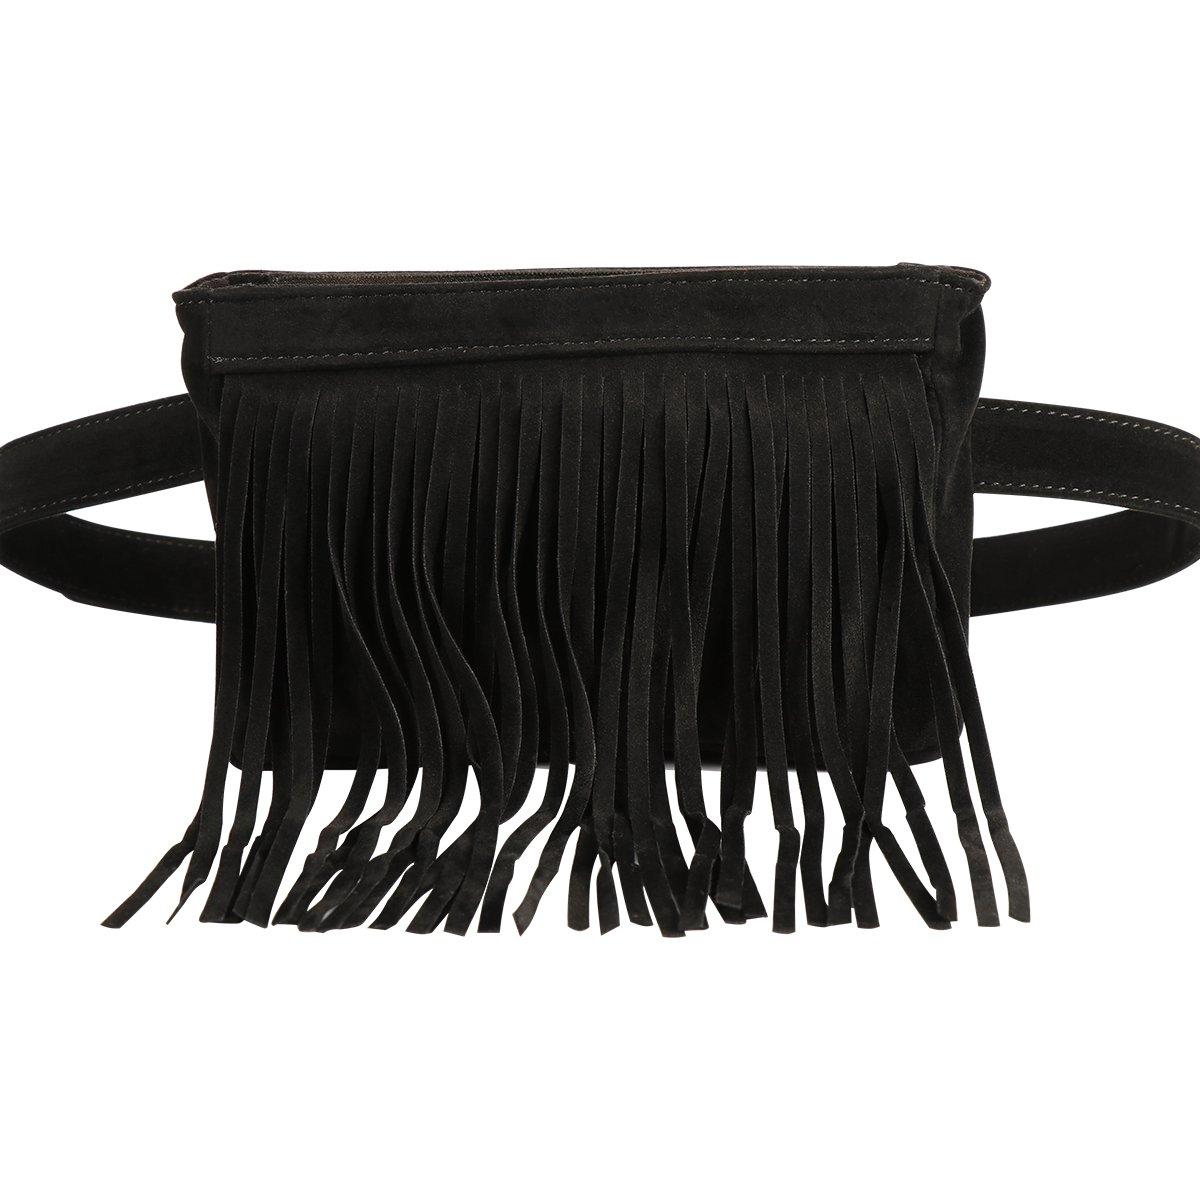 xhorizon FL1 Womens Elegant Leather Fanny Pack Cute Waist Pouch Stylish Travel Cell Phone Bag (Blue) 201710310444D